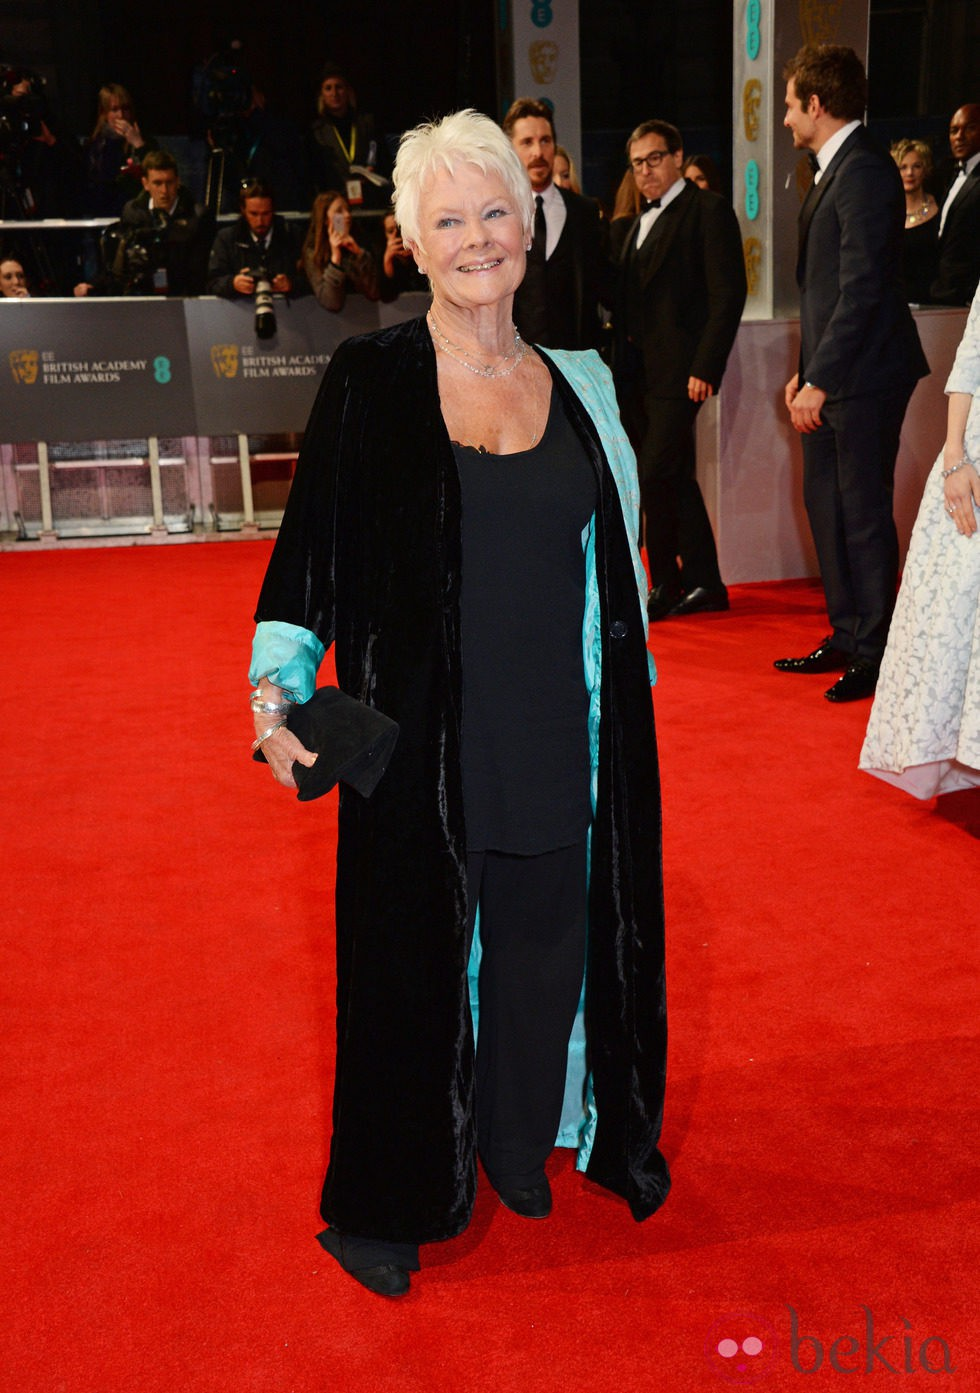 Judi Dench en los BAFTA 2014